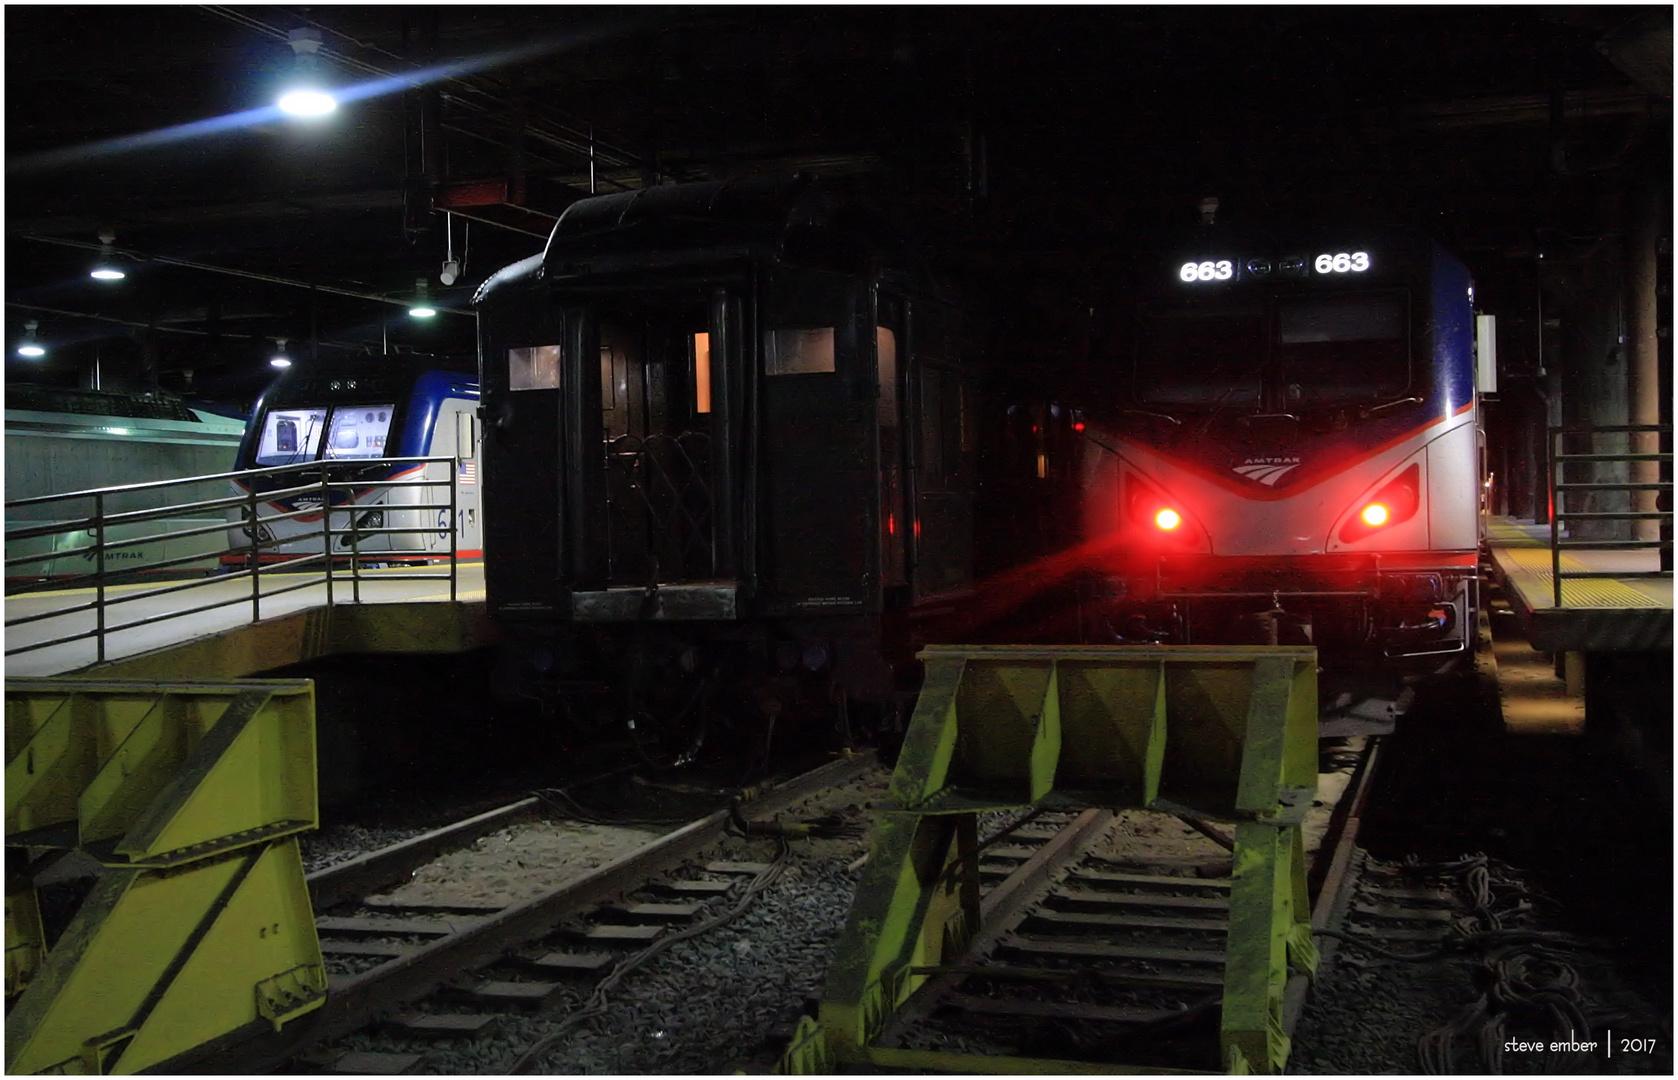 Night Trains No. 4 - A 'Time Machine' at 2 AM